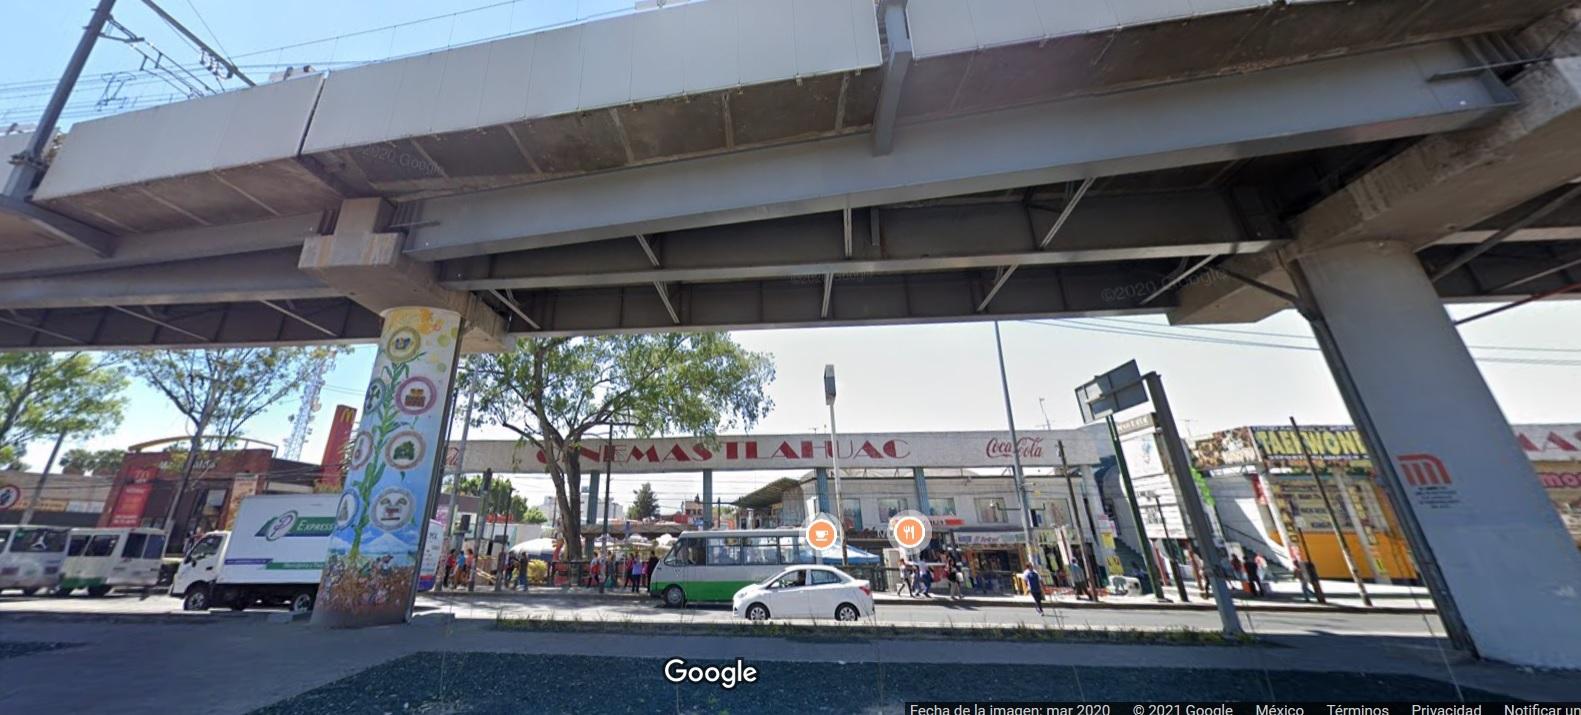 Plaza Tláhuac, Línea 12, Google Maps, Metro Olivos